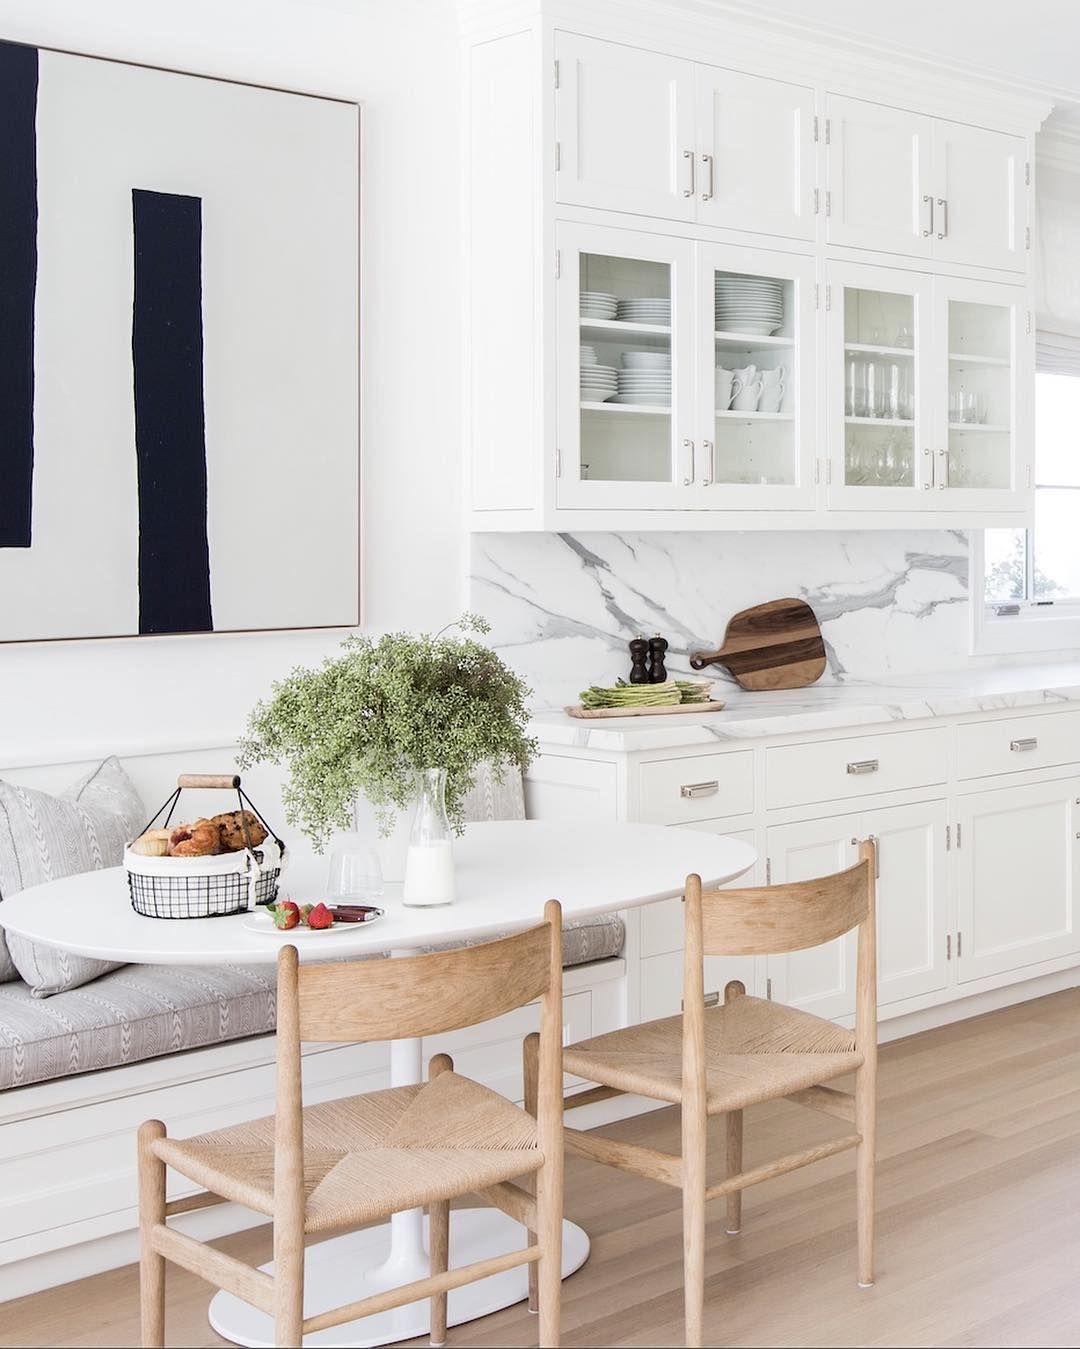 Cocina | ◈ Casa acogedora ◈ | Pinterest | Casa acogedora, Acogedor ...